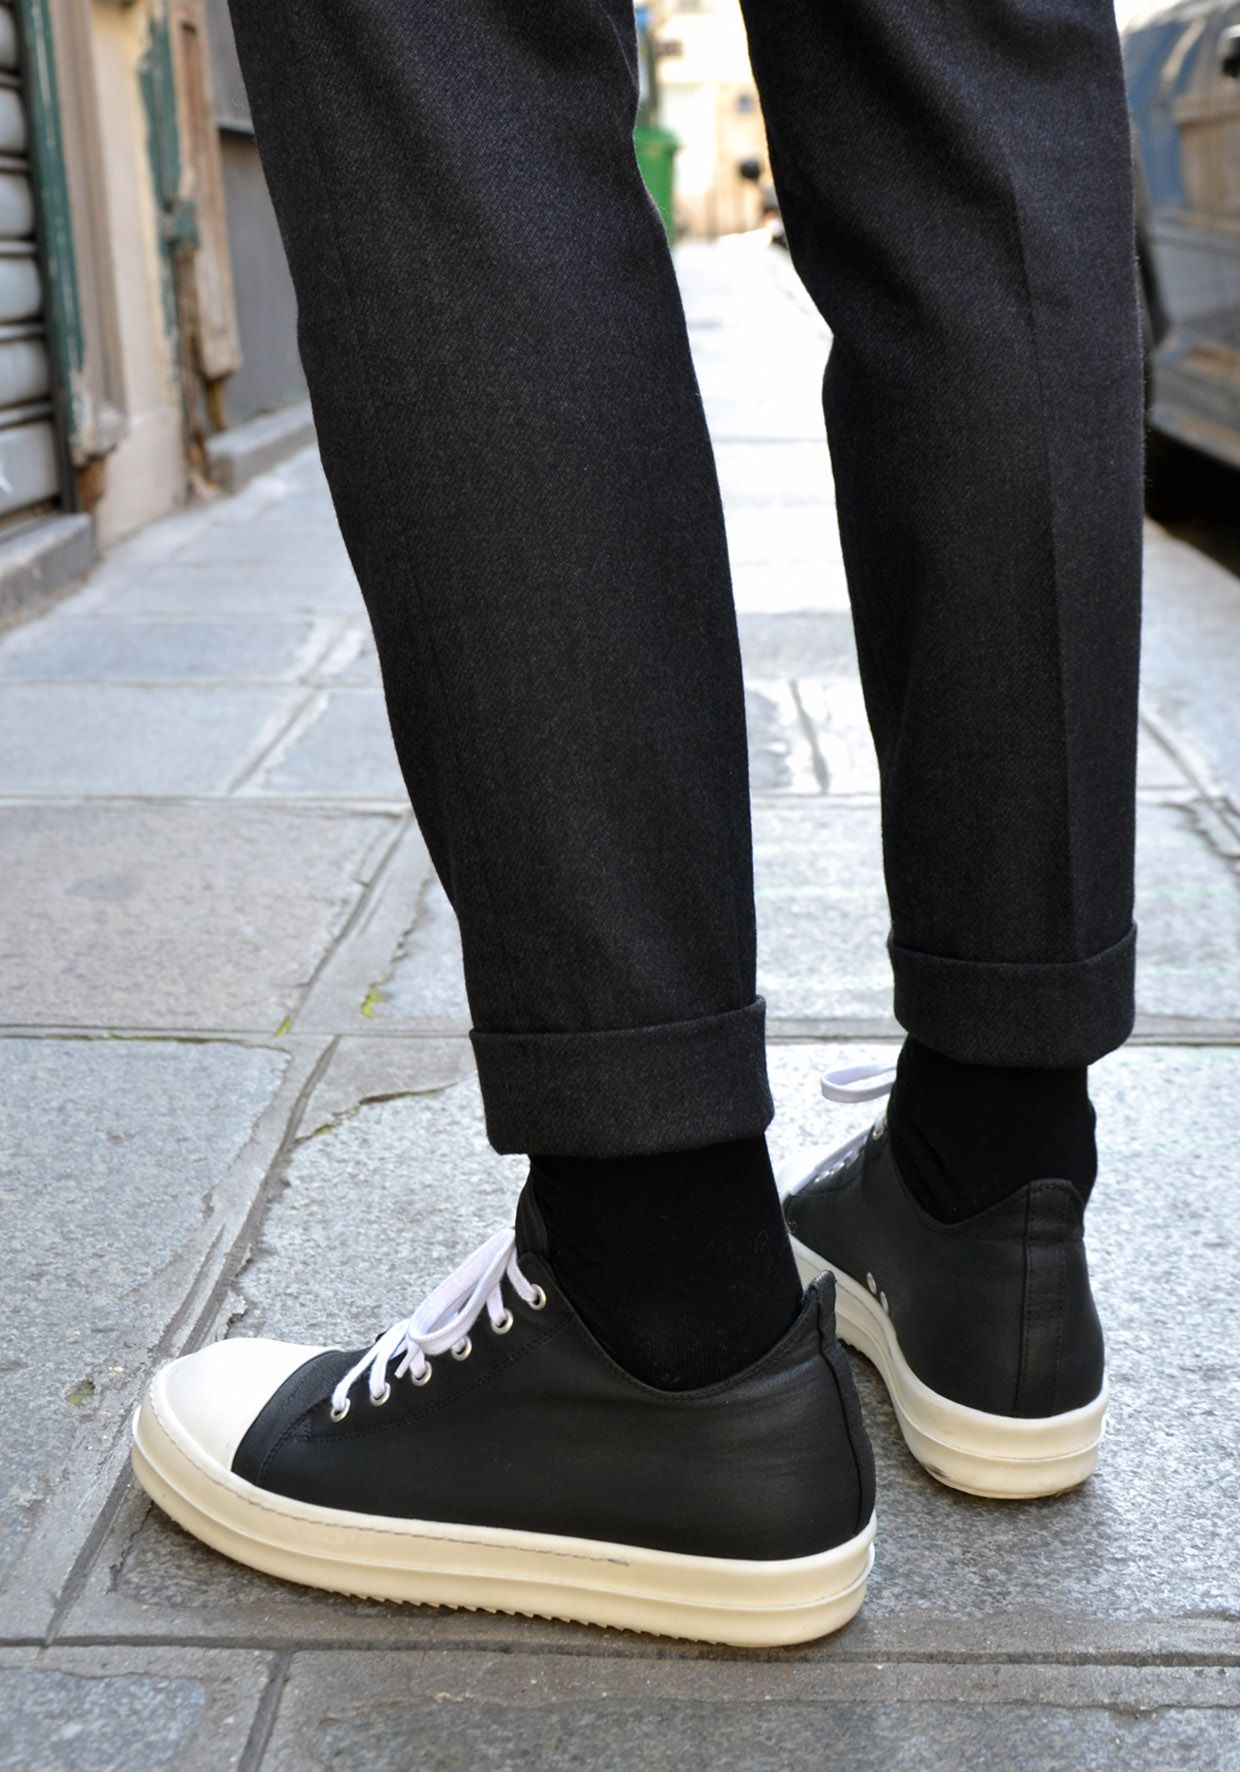 d958d09b4b7 HARRYJWC Rick Owens Sneakers